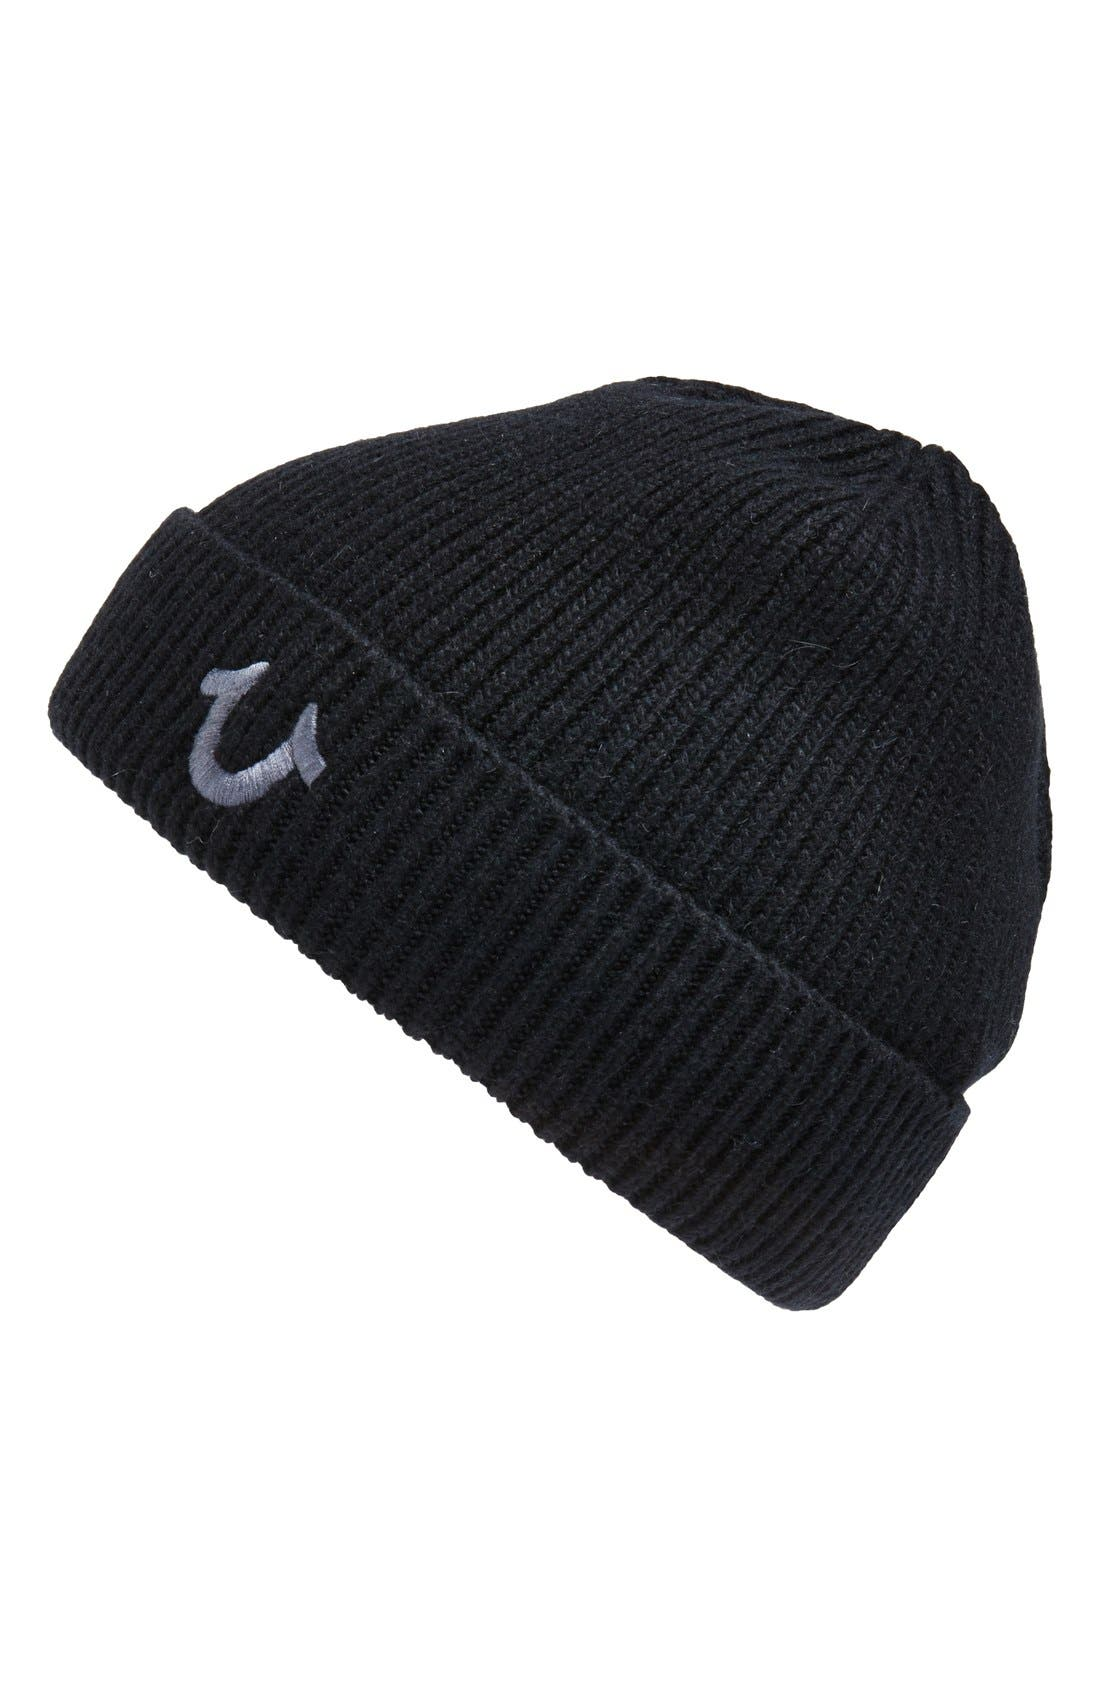 Rib Knit Cap,                             Main thumbnail 1, color,                             Black/Grey